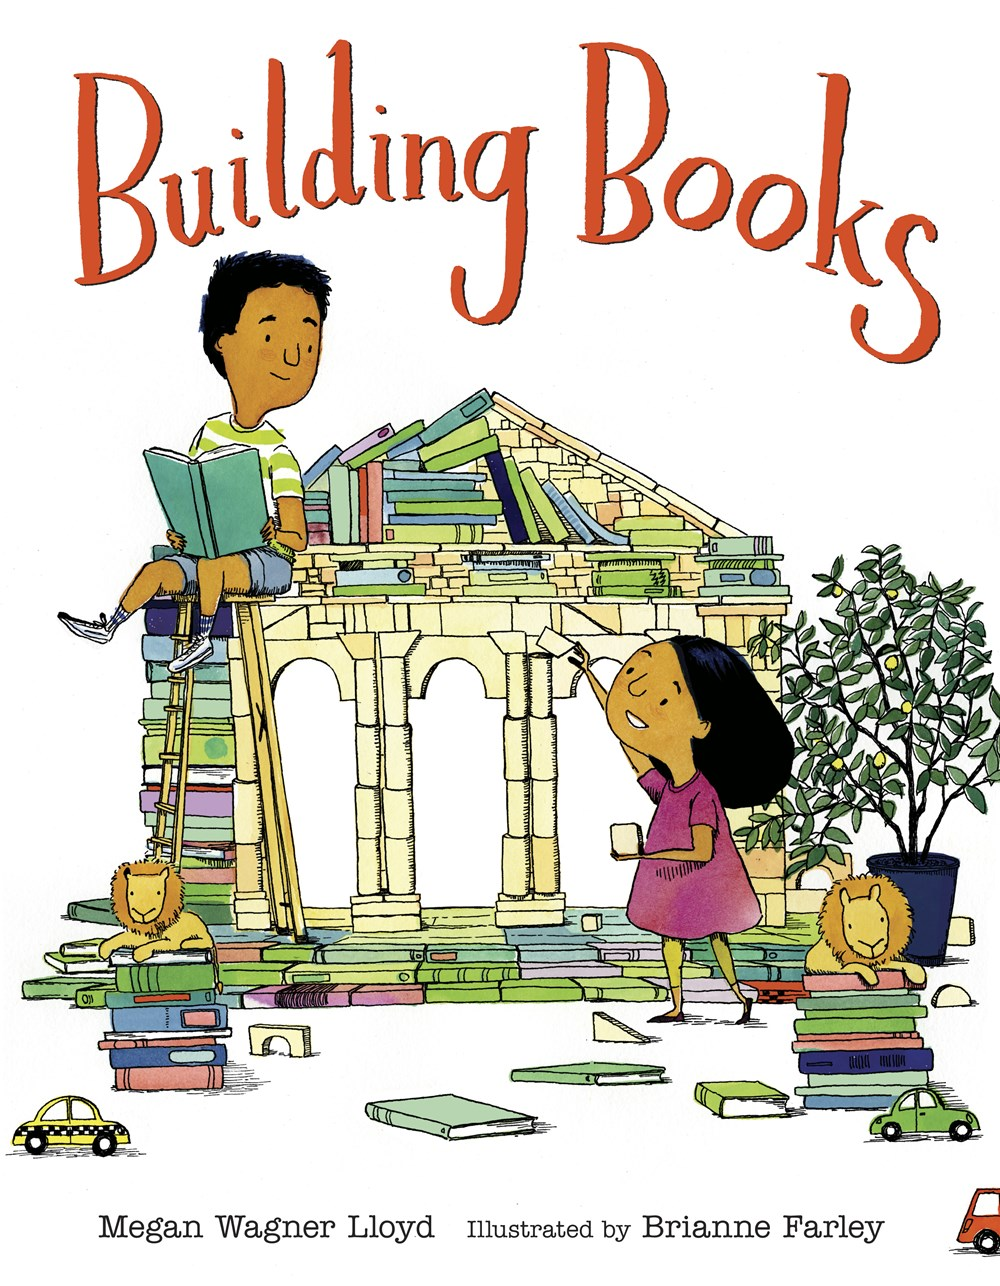 buildingbooks.jpg